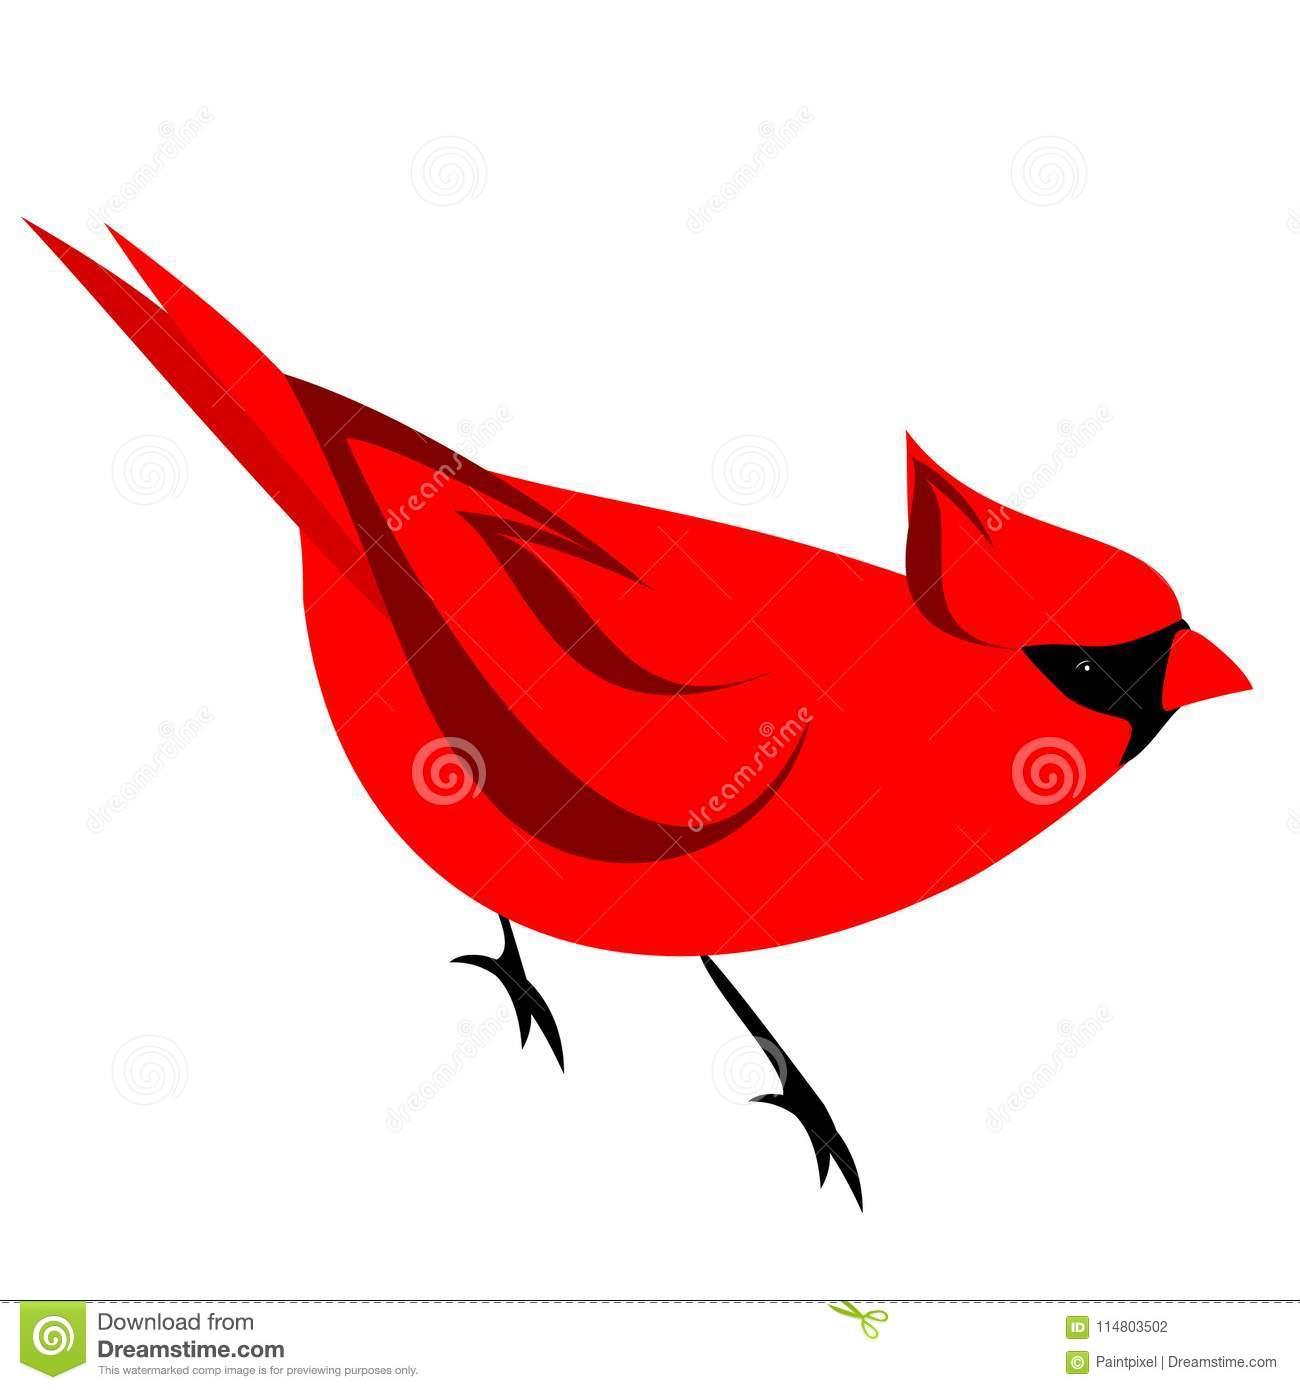 Cardinal clipart 1 » Clipart Station.